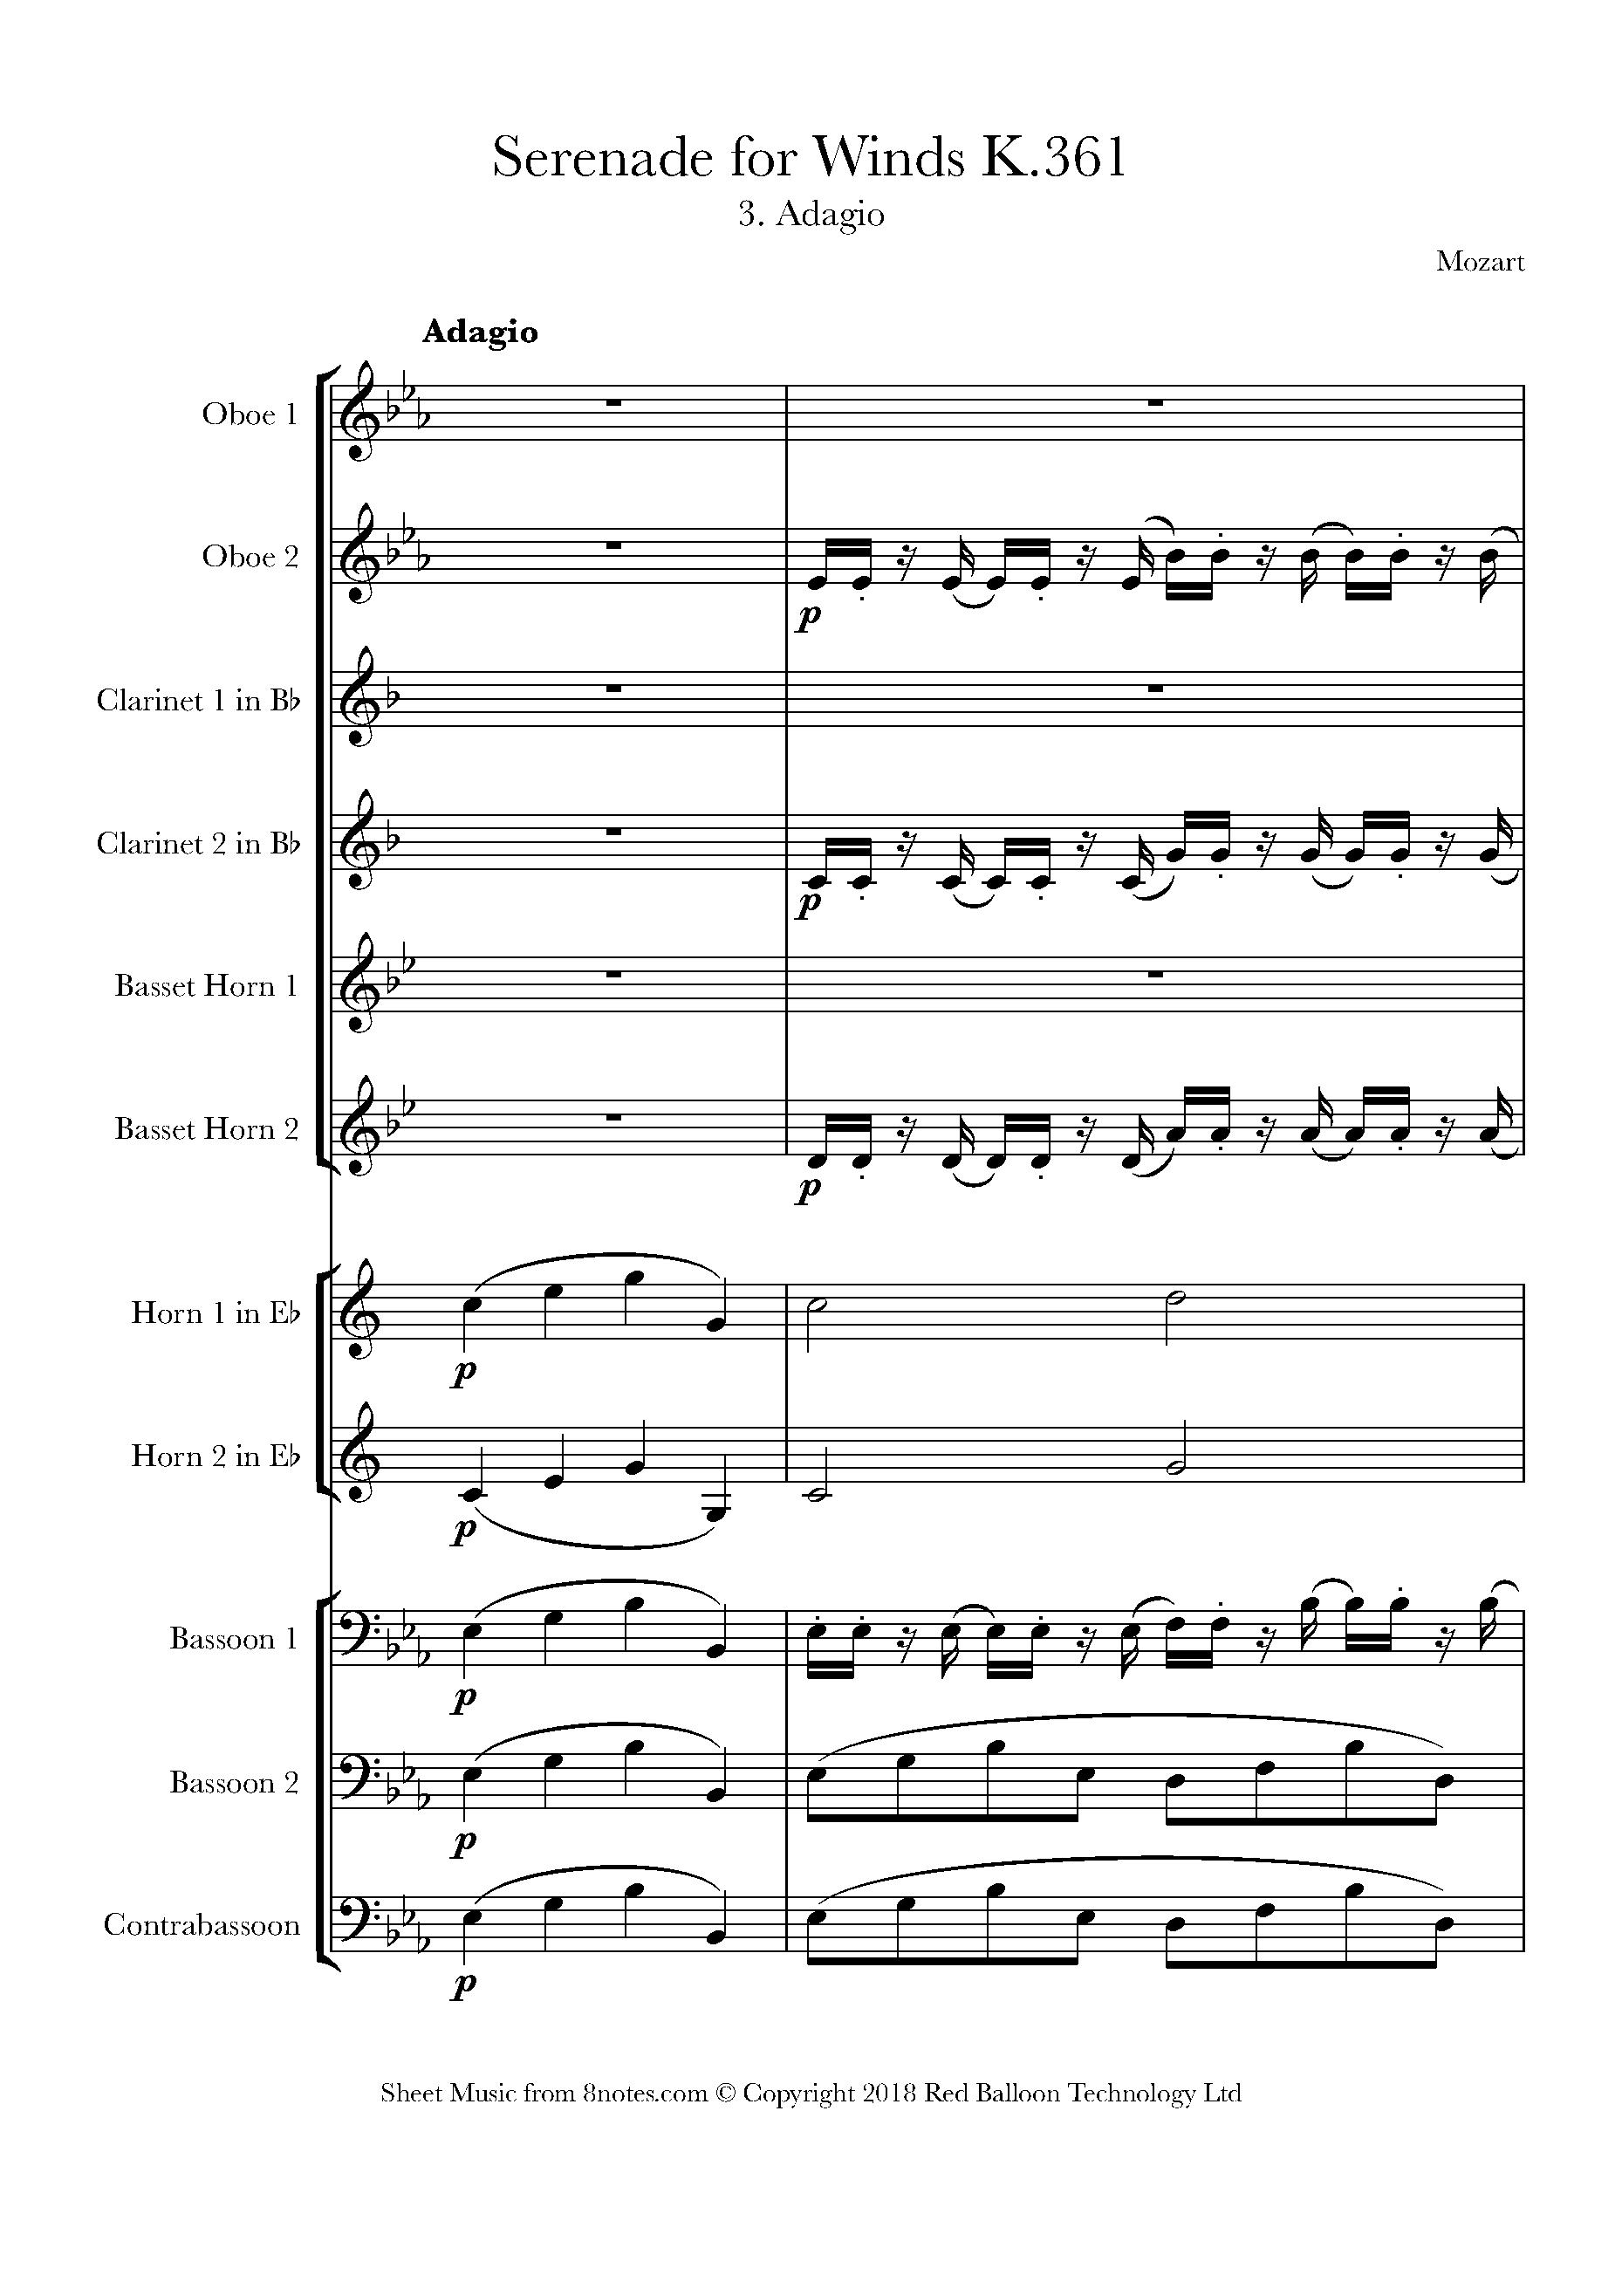 mozart - serenade no. 10 for winds (gran partita), 3rd movement, adagio sheet  music for wind ensemble - 8notes.com  8notes